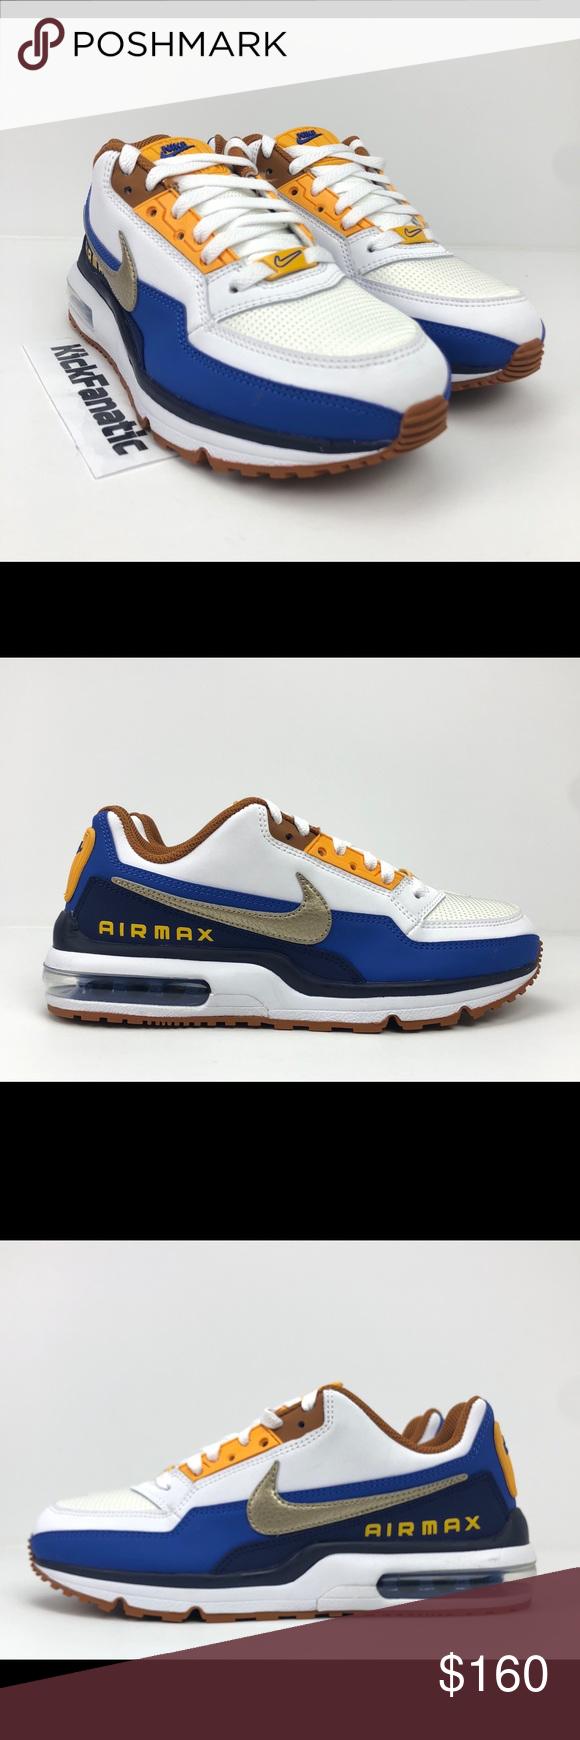 instalaciones Preferencia Mejora  Nike Air Max LTD 3 Premium Limited Edition Shoes Nike Air Max LTD 3 Premium Limited  Edition Shoes White Blu…   Nike air max ltd, Nike air max, Limited edition  shoes